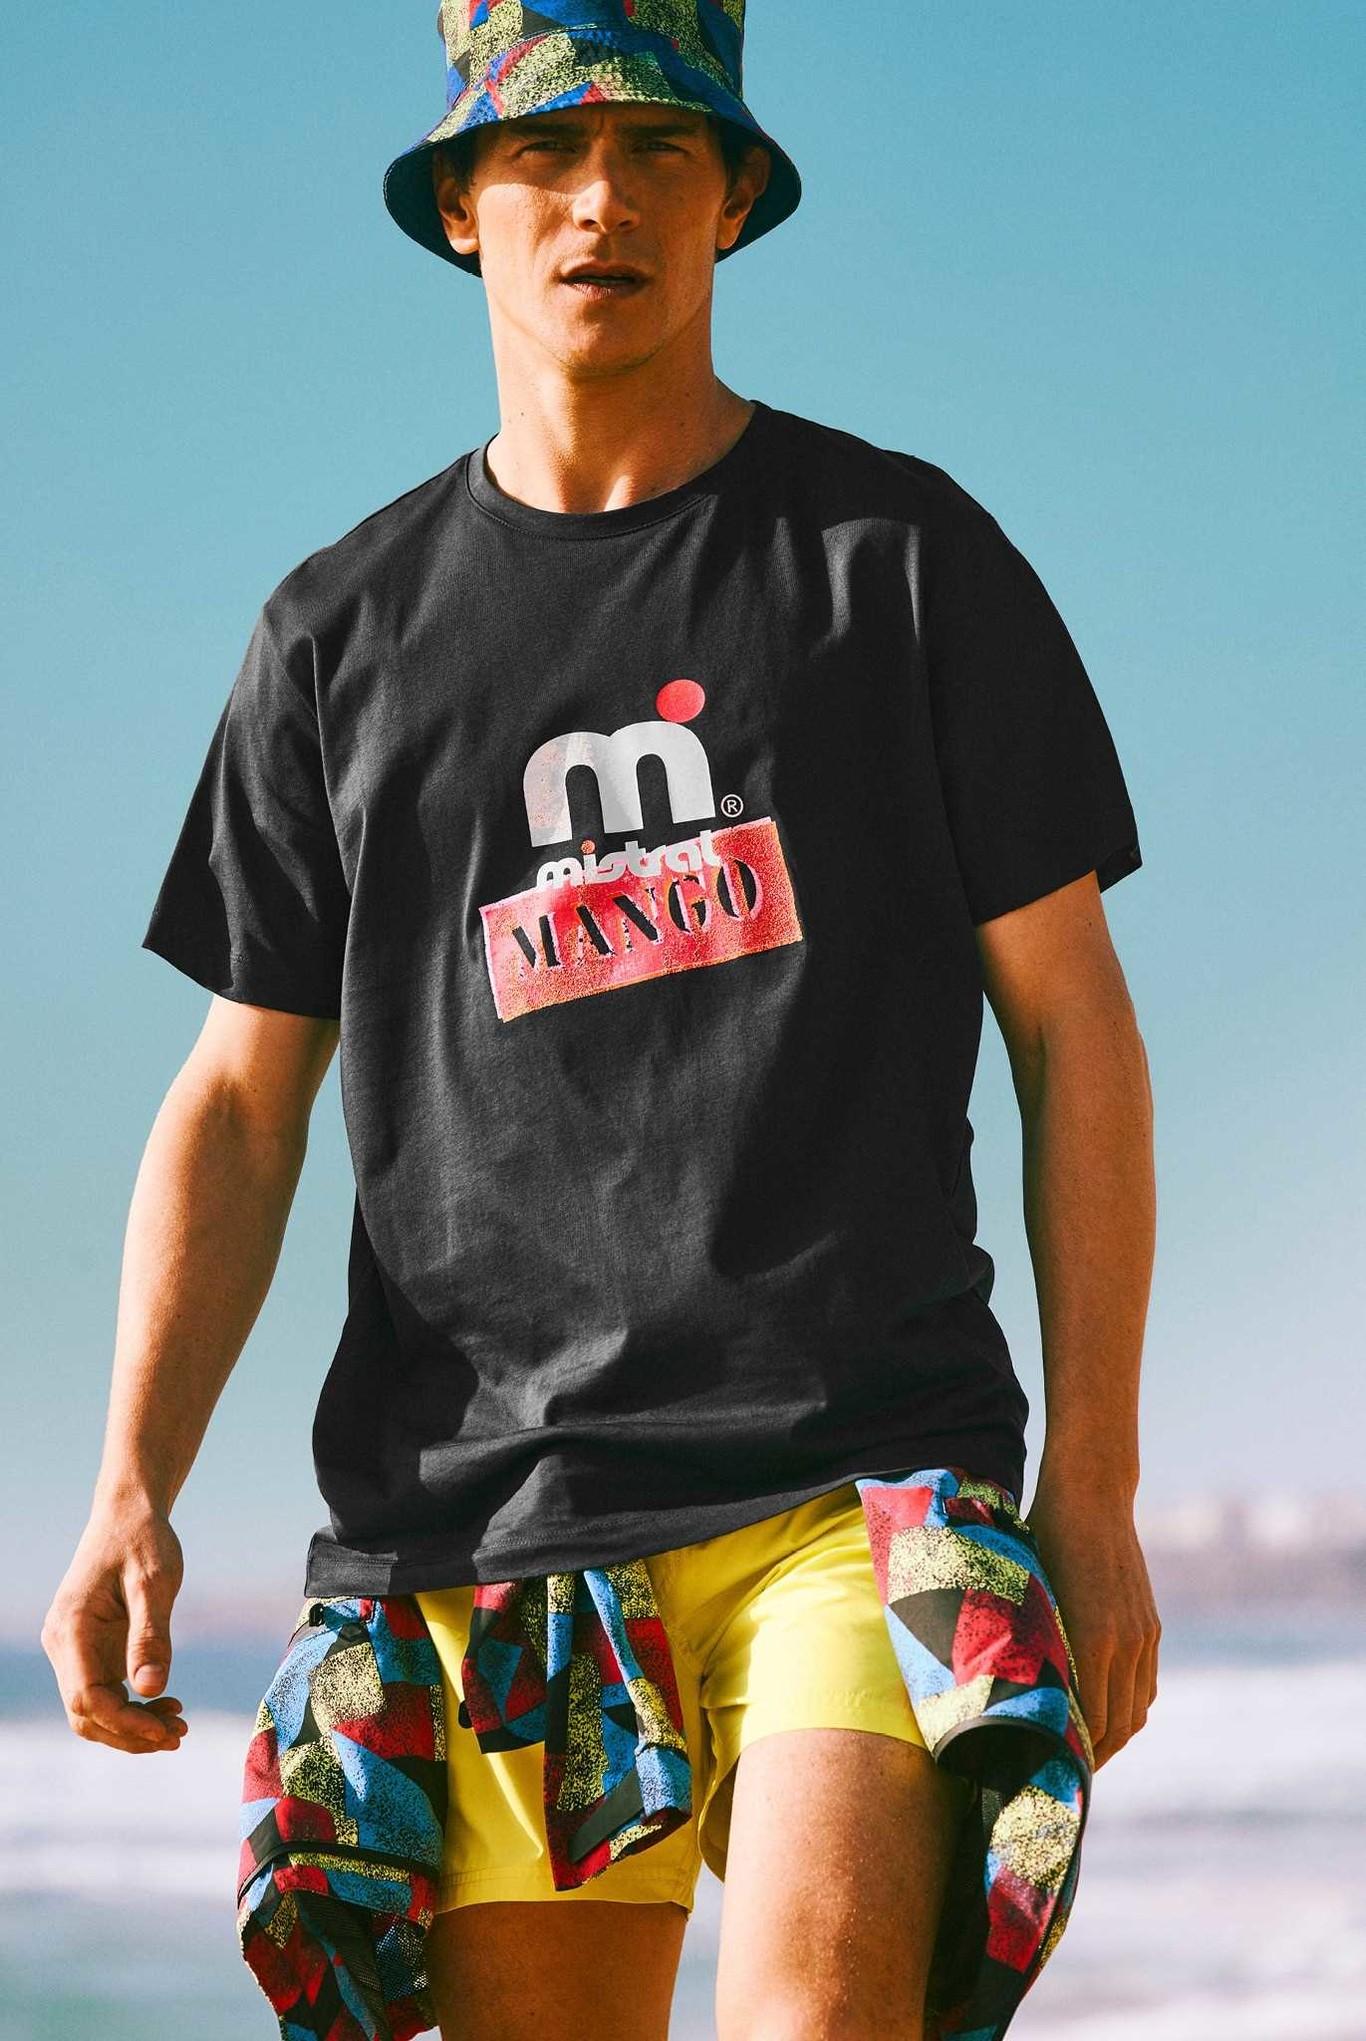 MANGO MISTRAL 07